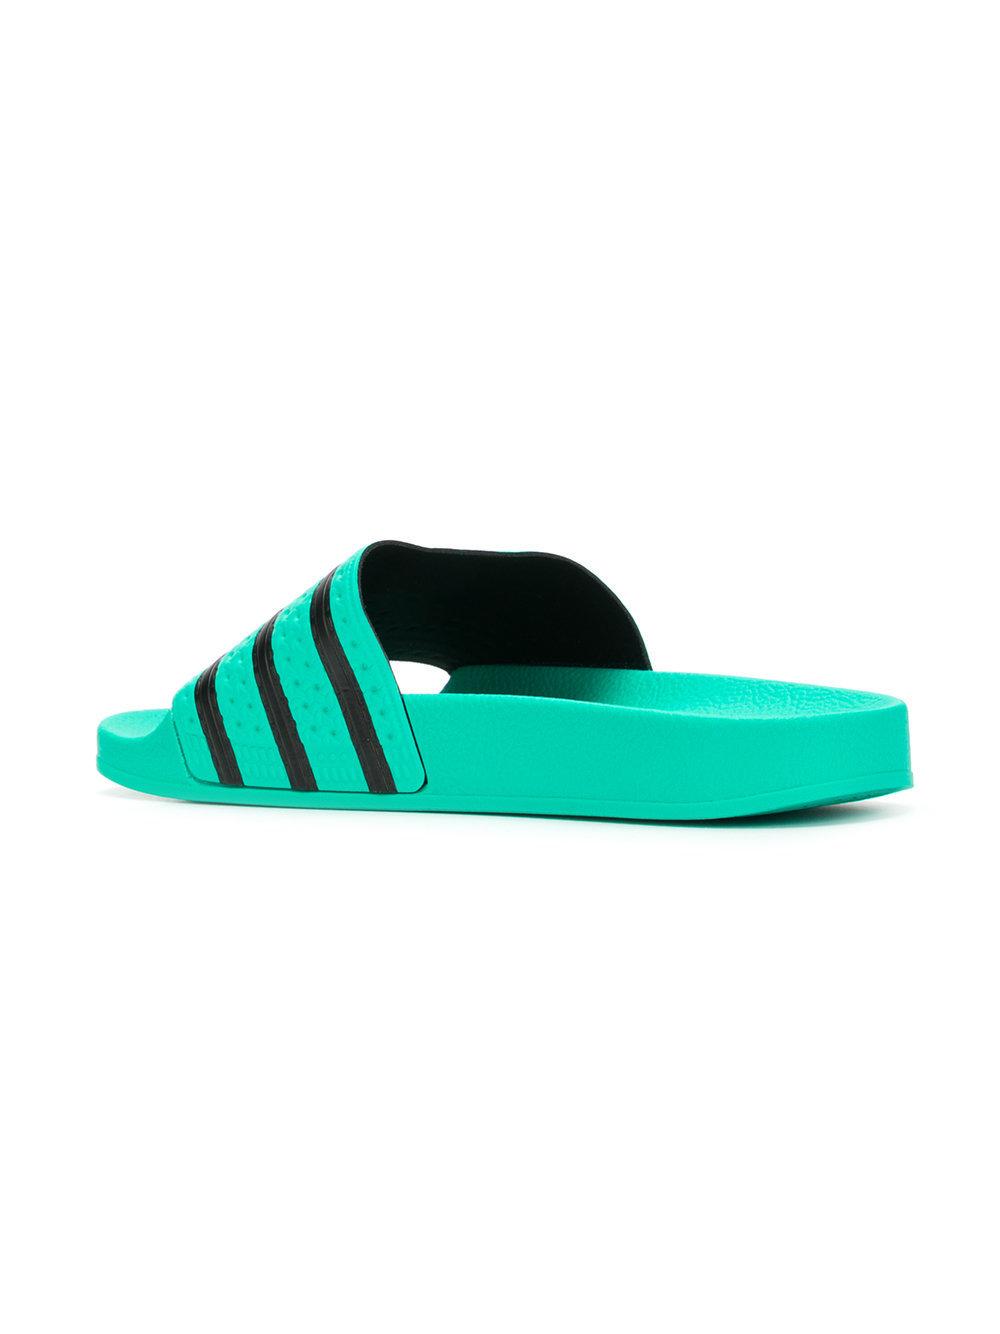 124d2d99db28 adidas Adilette Slides